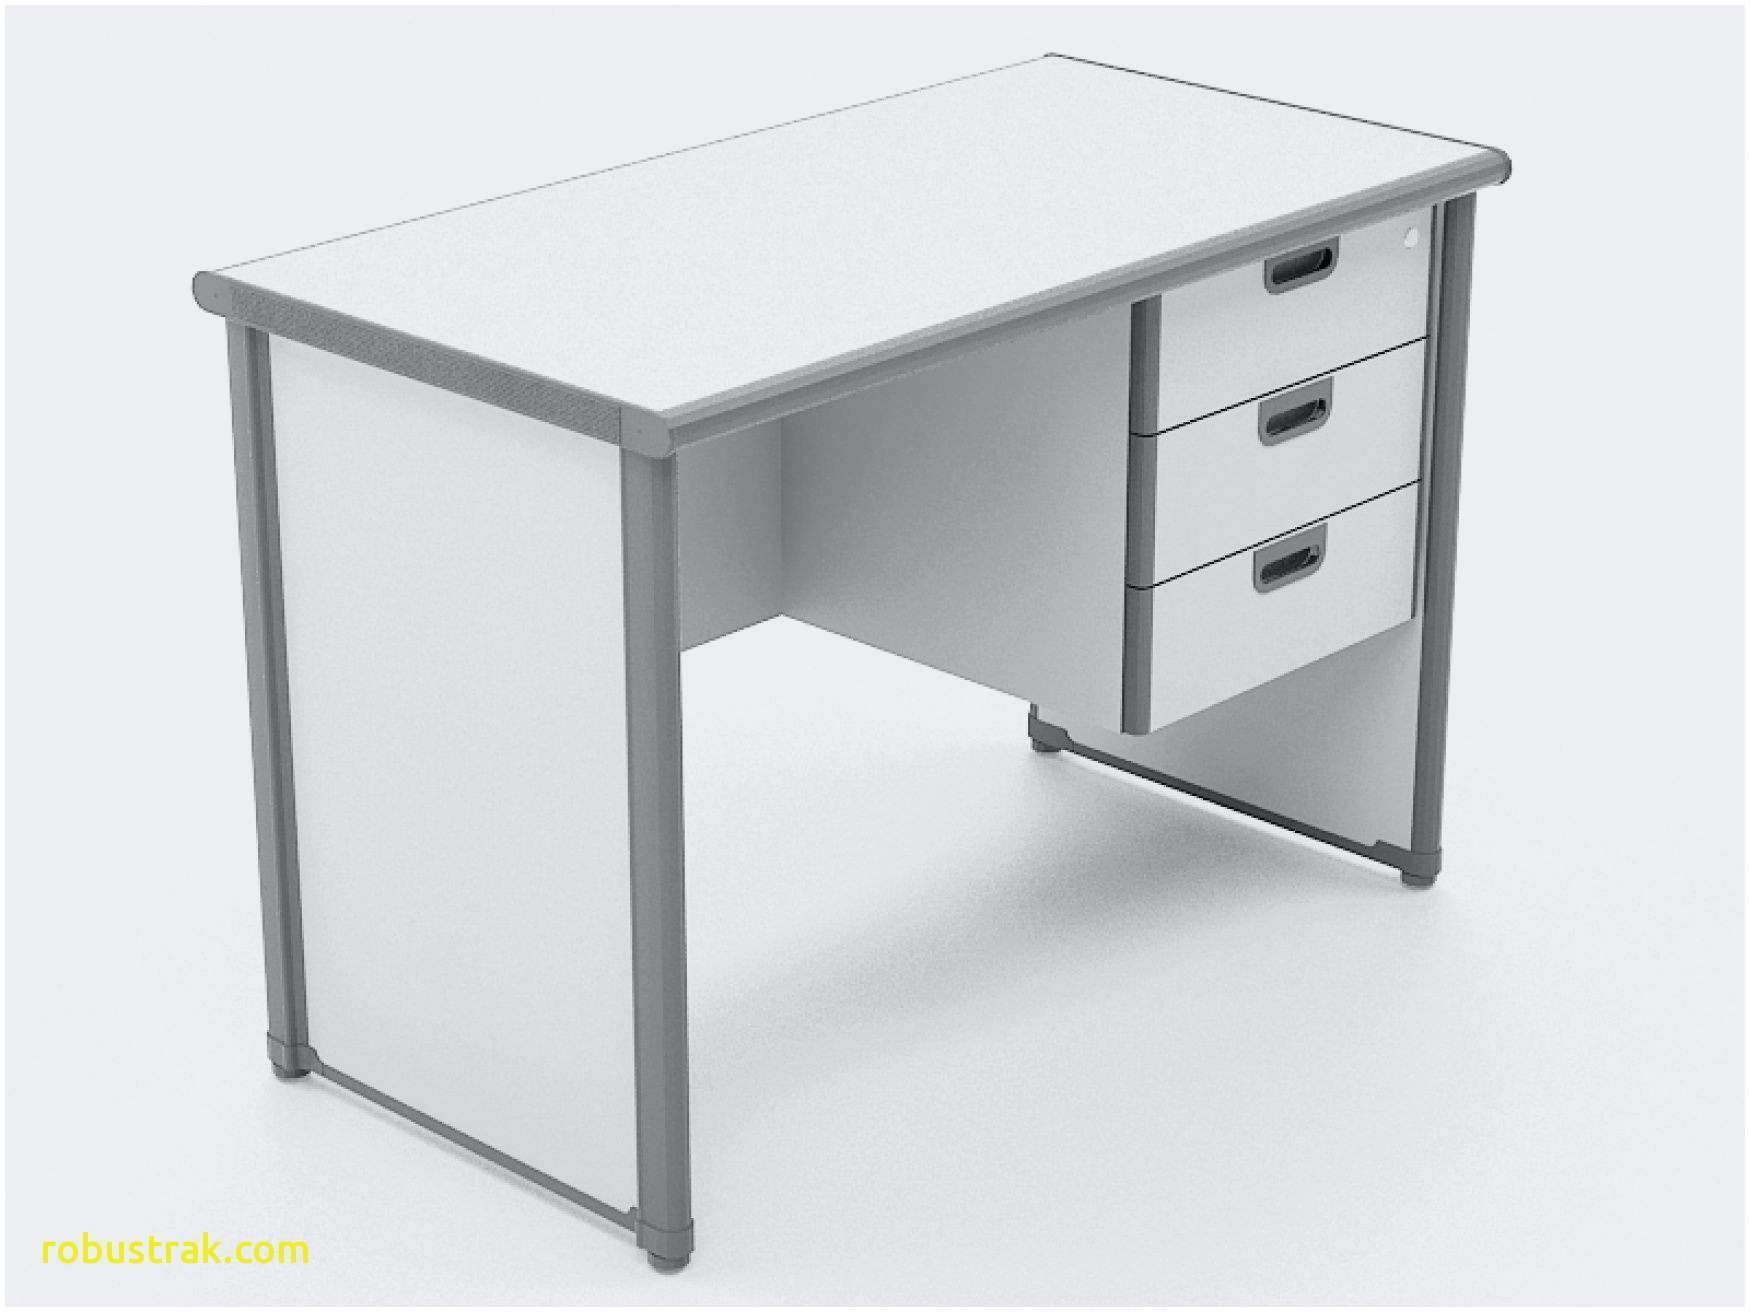 Acrylic Computer Desk Trending Decor New Home Designs House Design